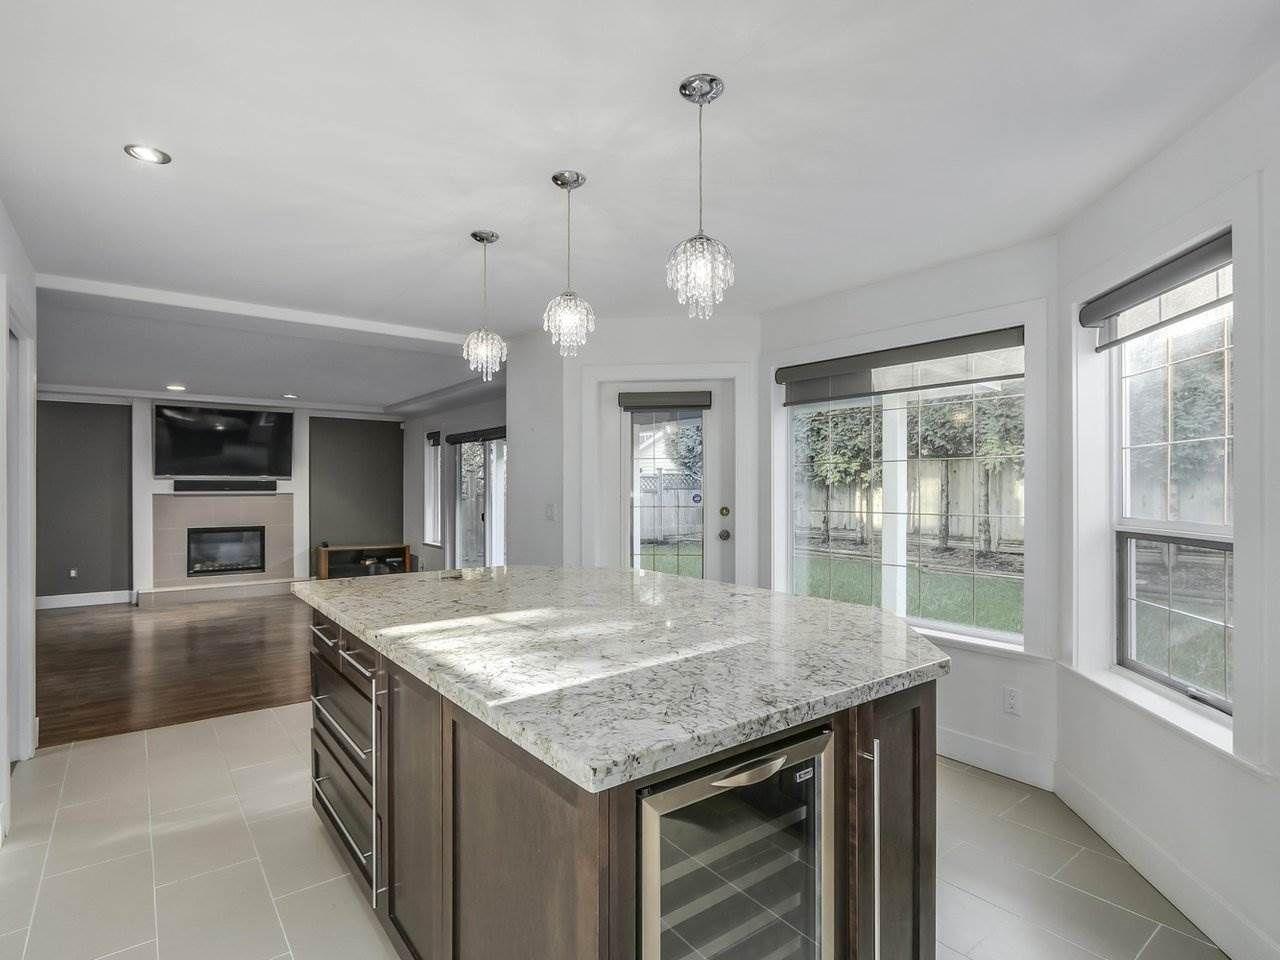 Photo 10: Photos: 12548 25A Avenue in Surrey: Crescent Bch Ocean Pk. House for sale (South Surrey White Rock)  : MLS®# R2328780